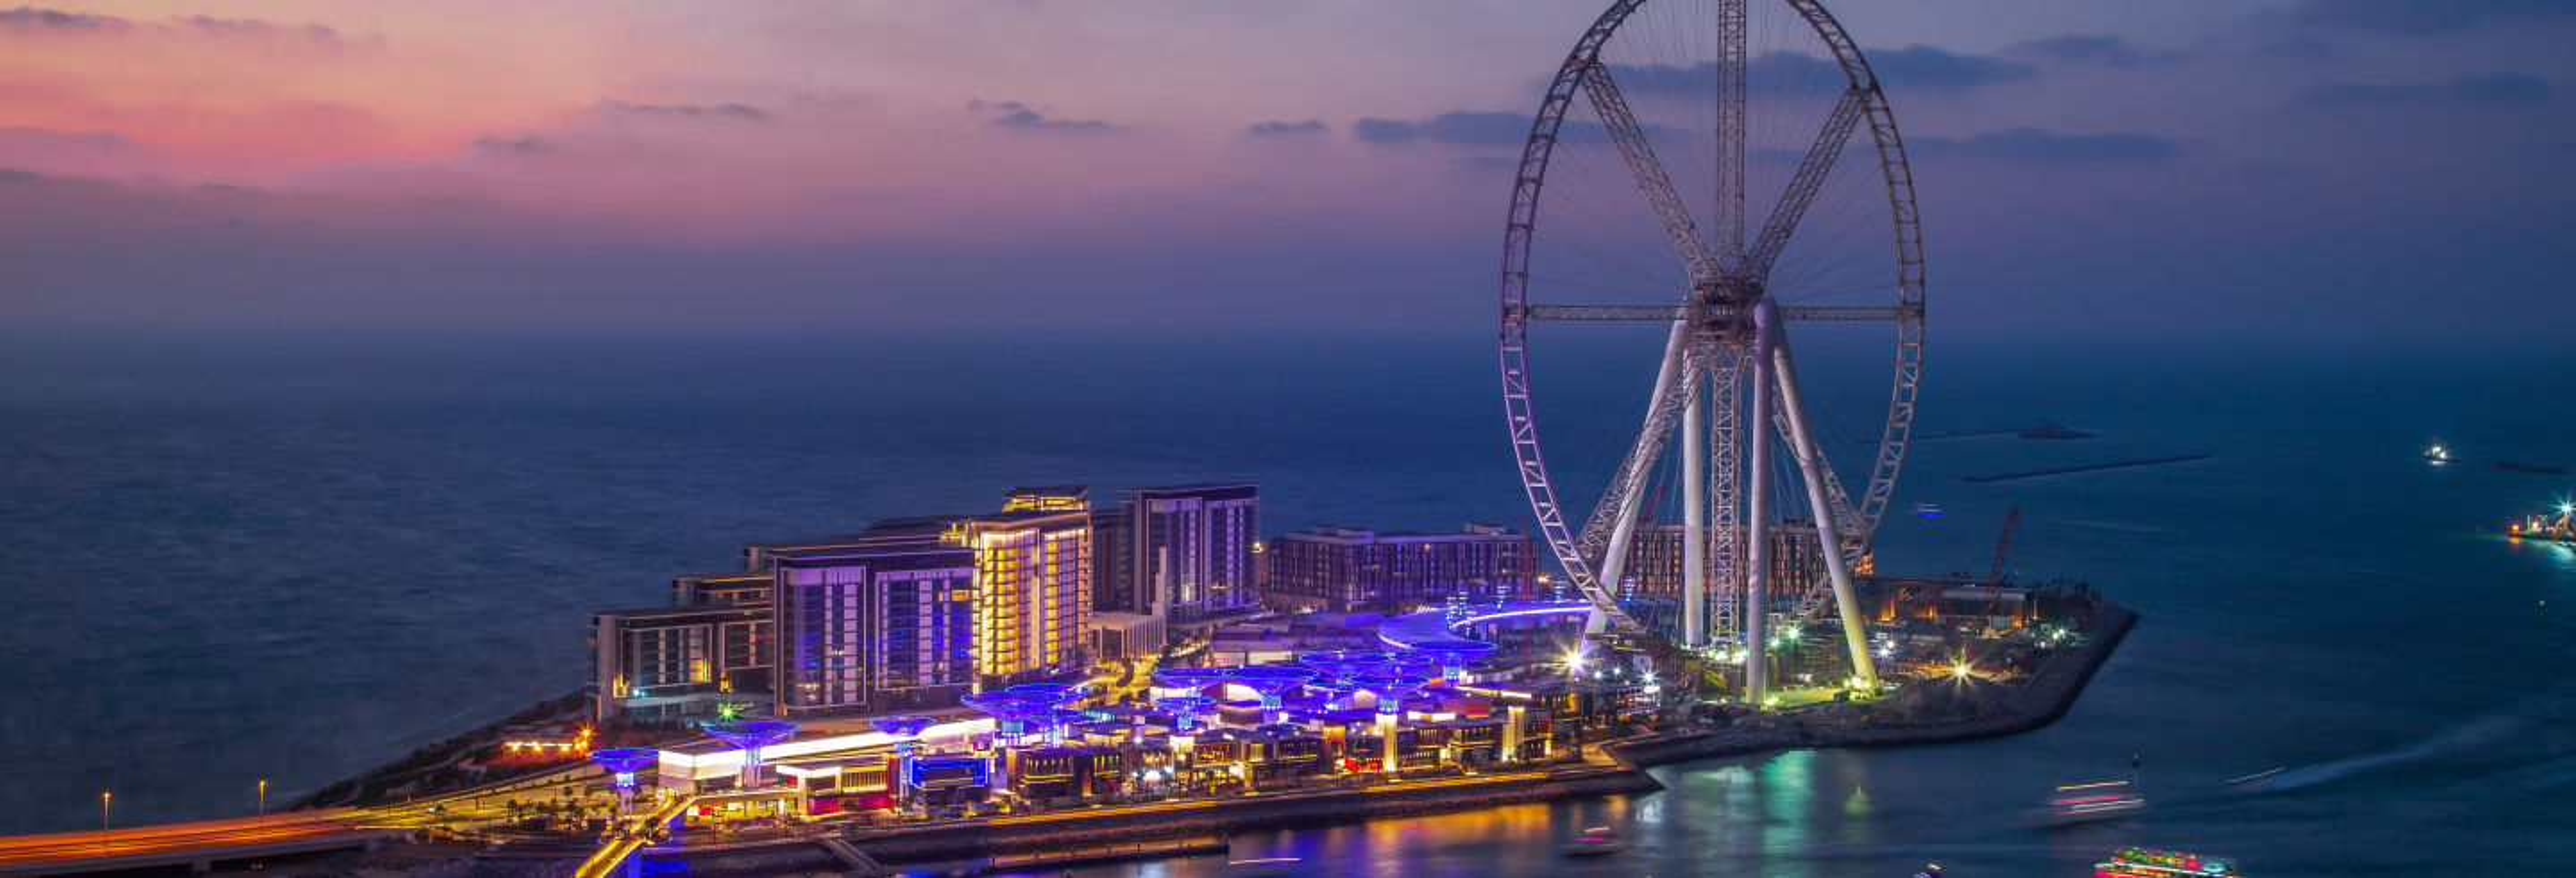 Tour nocturno por Dubái